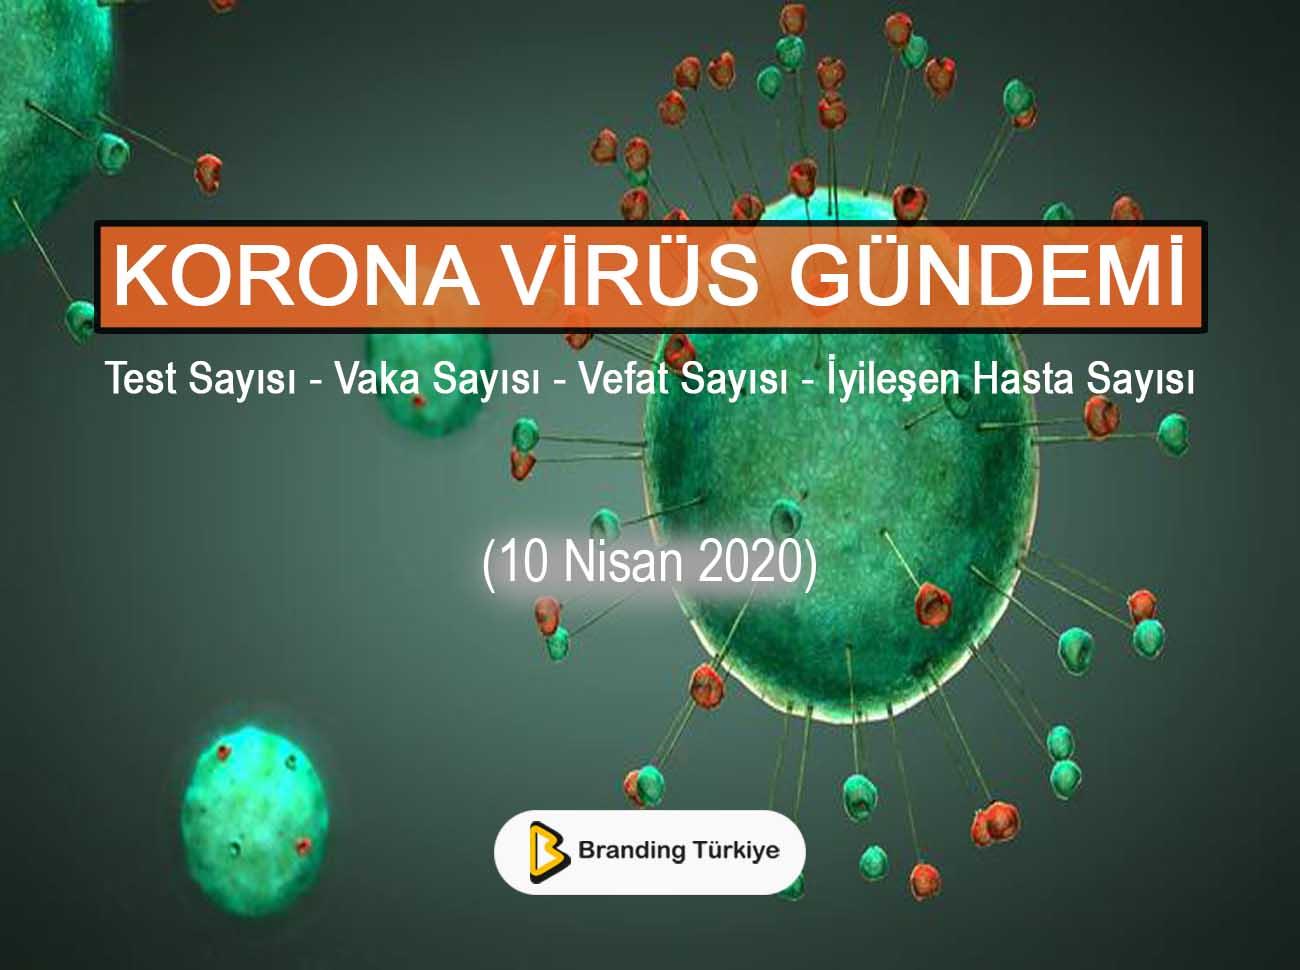 Korona Virüs Gündemi (10 Nisan 2020)